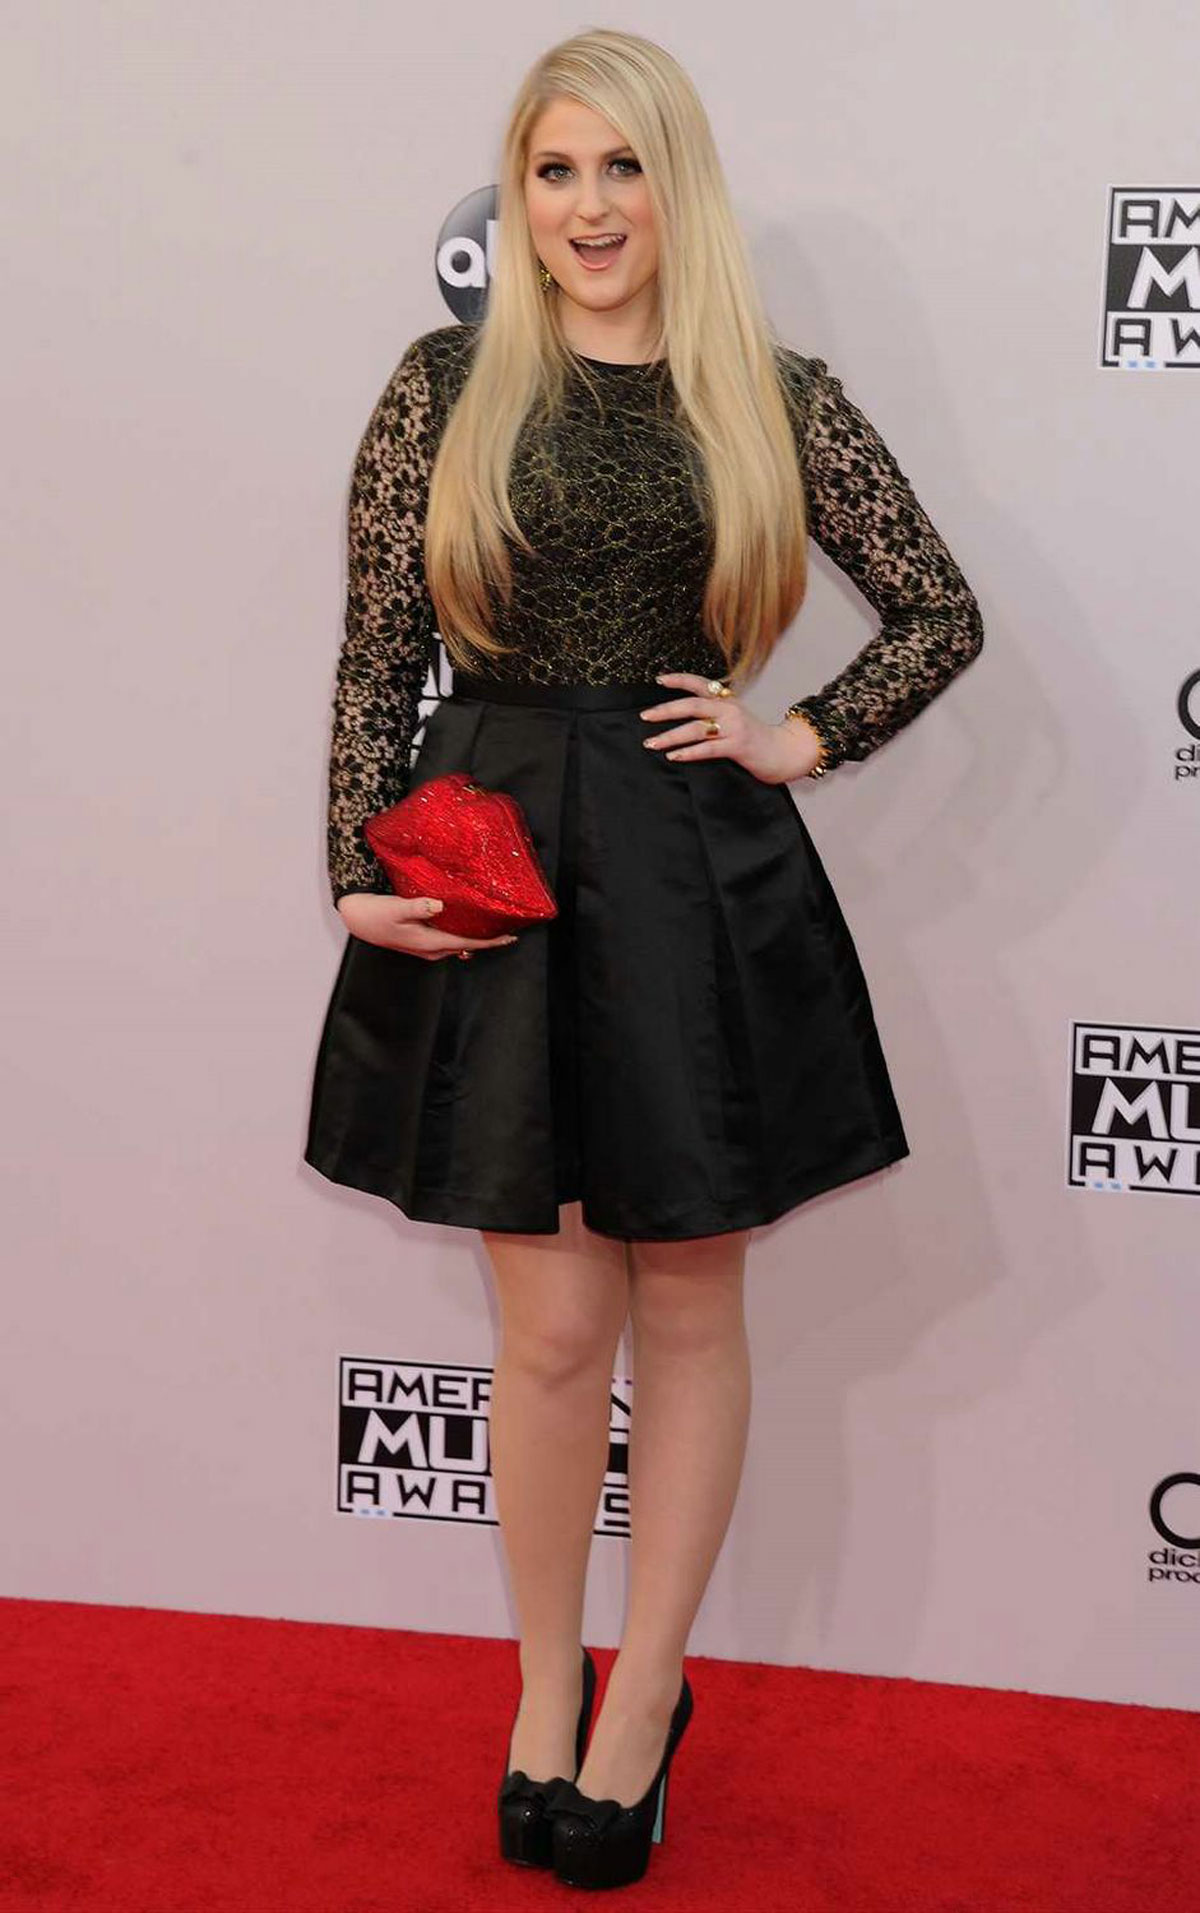 Meghan Trainor At 2014 American Music Awards In Los